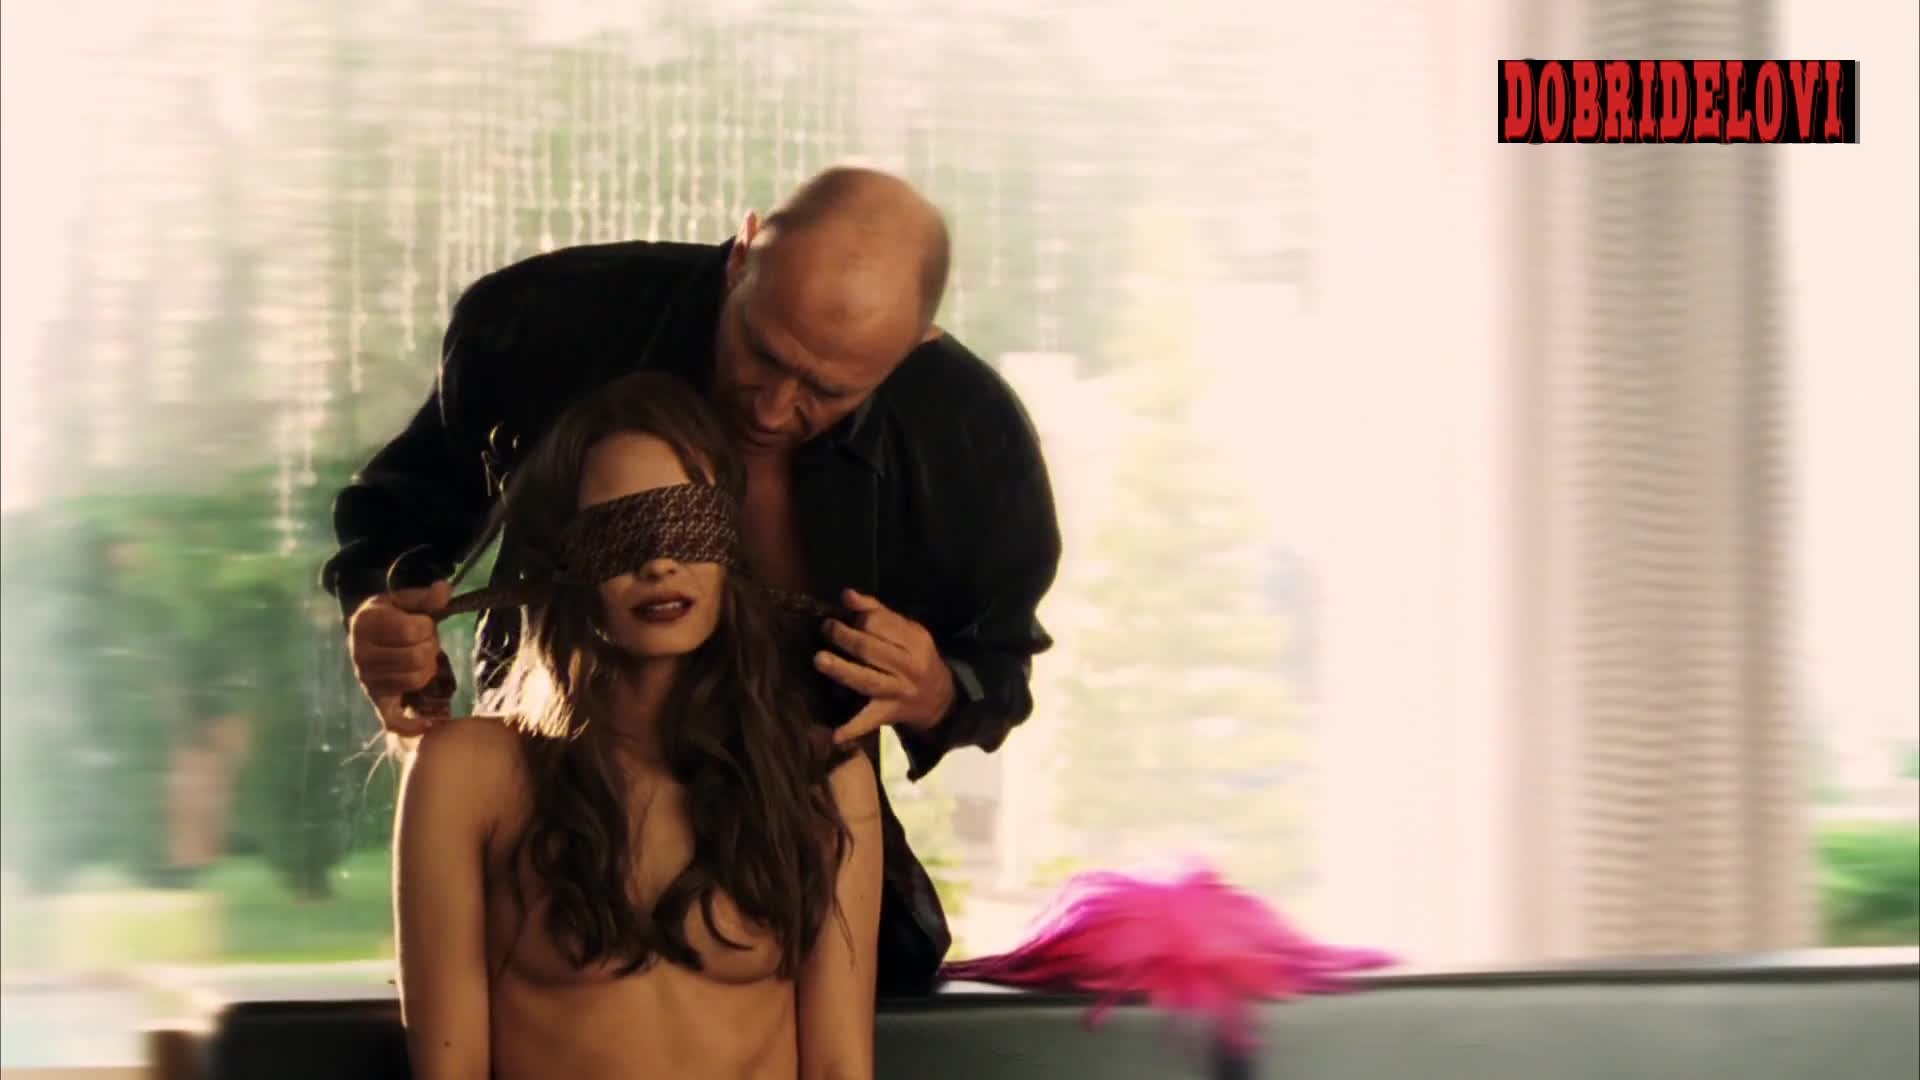 Shannyn Sossamon blindfolded and nude scene from Kiss Kiss Bang Bang